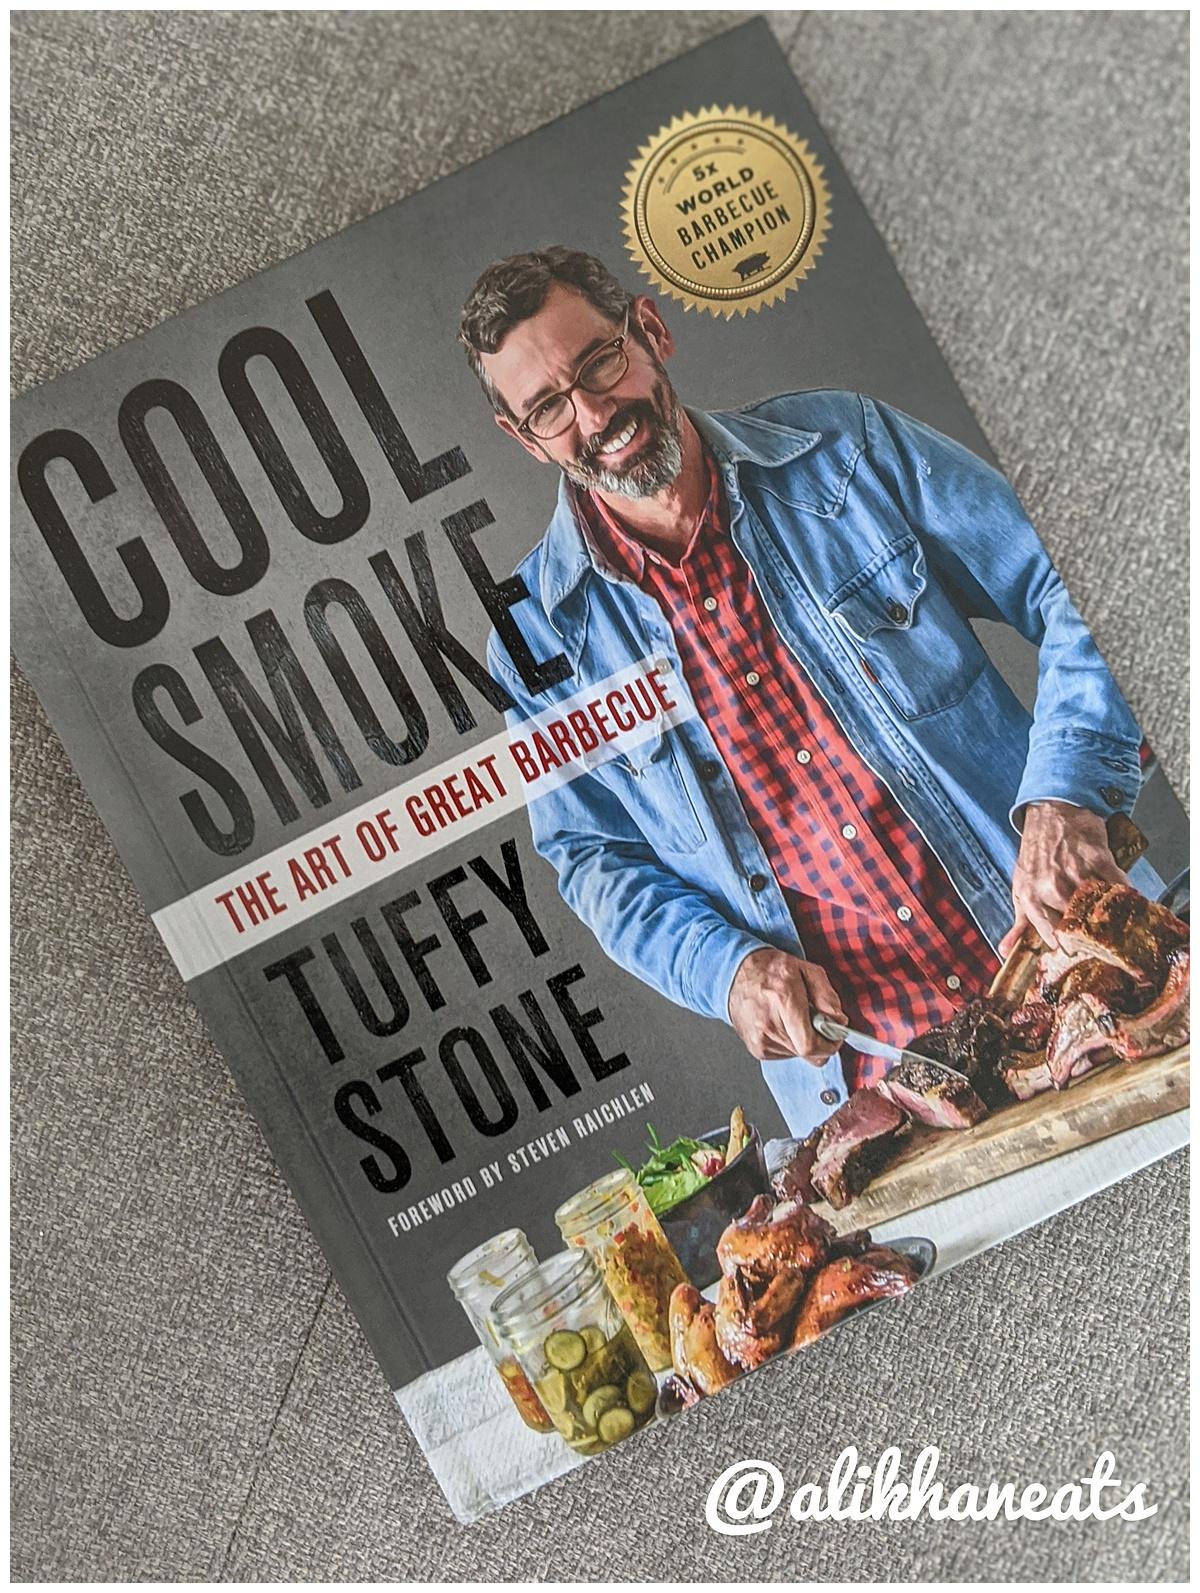 Cool Smoke Book cover